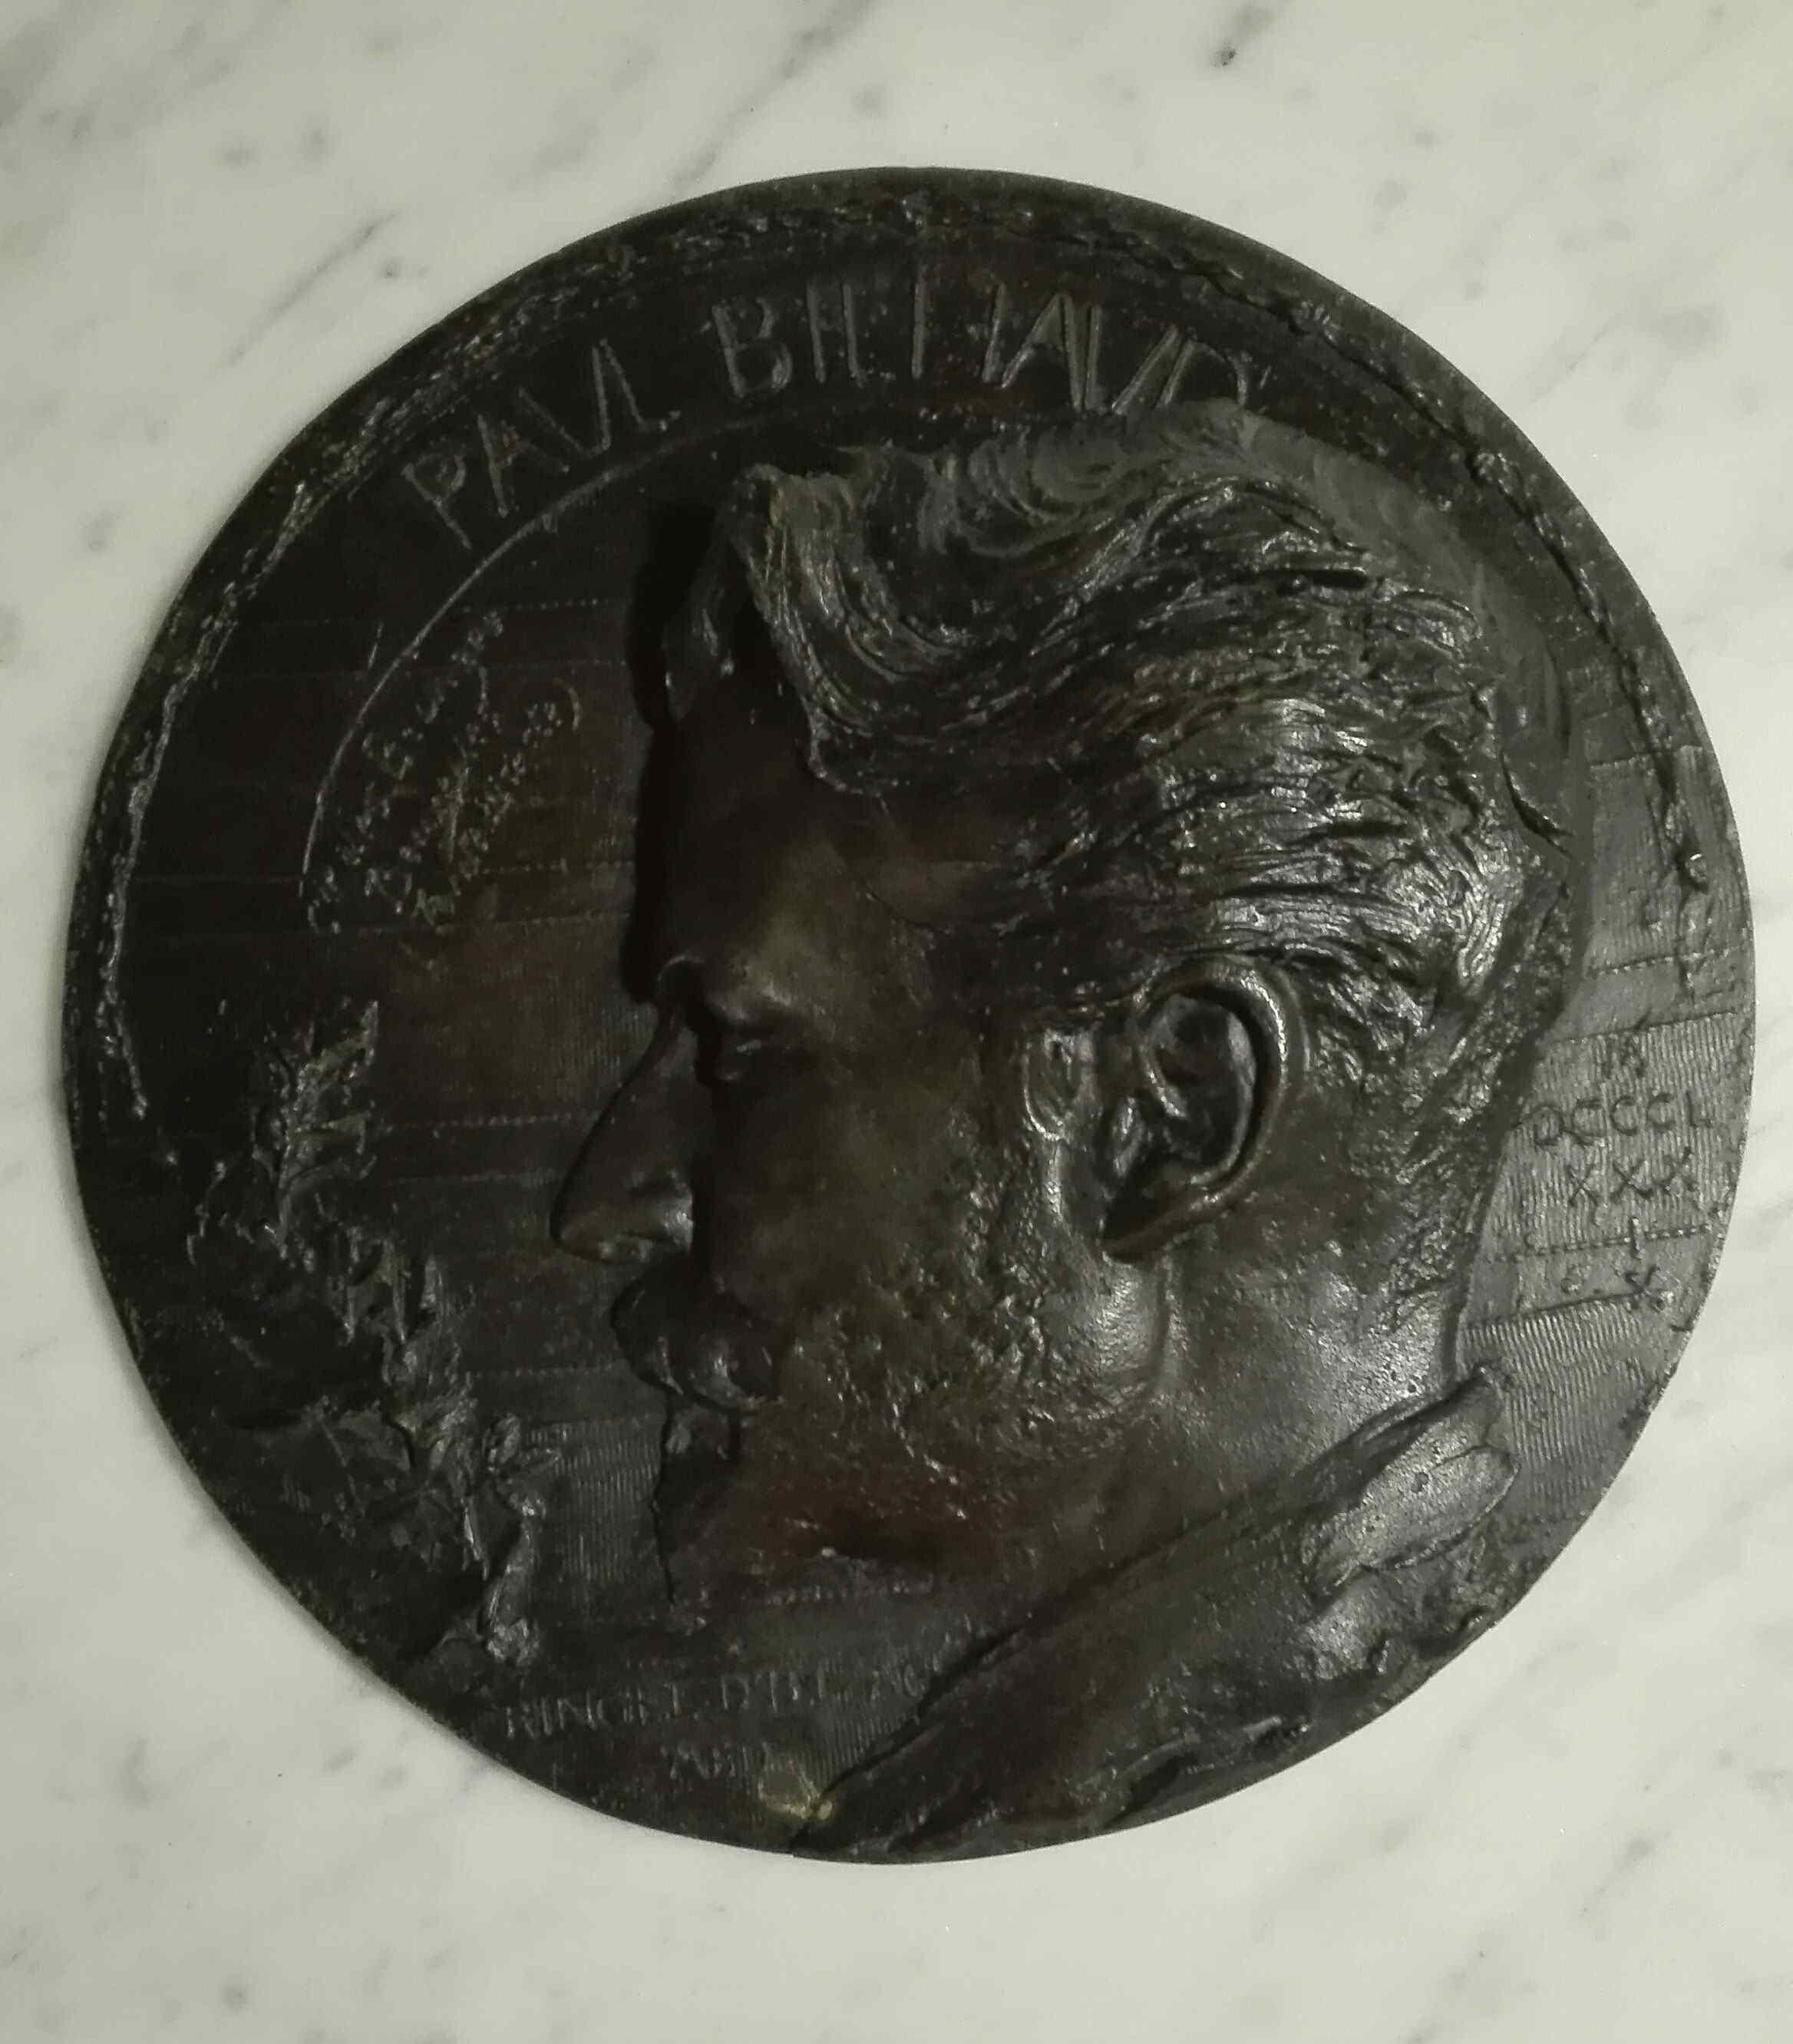 Jean Désiré RINGEL DI ILLZACH 1849-1916 Paul Bihaud ritratto